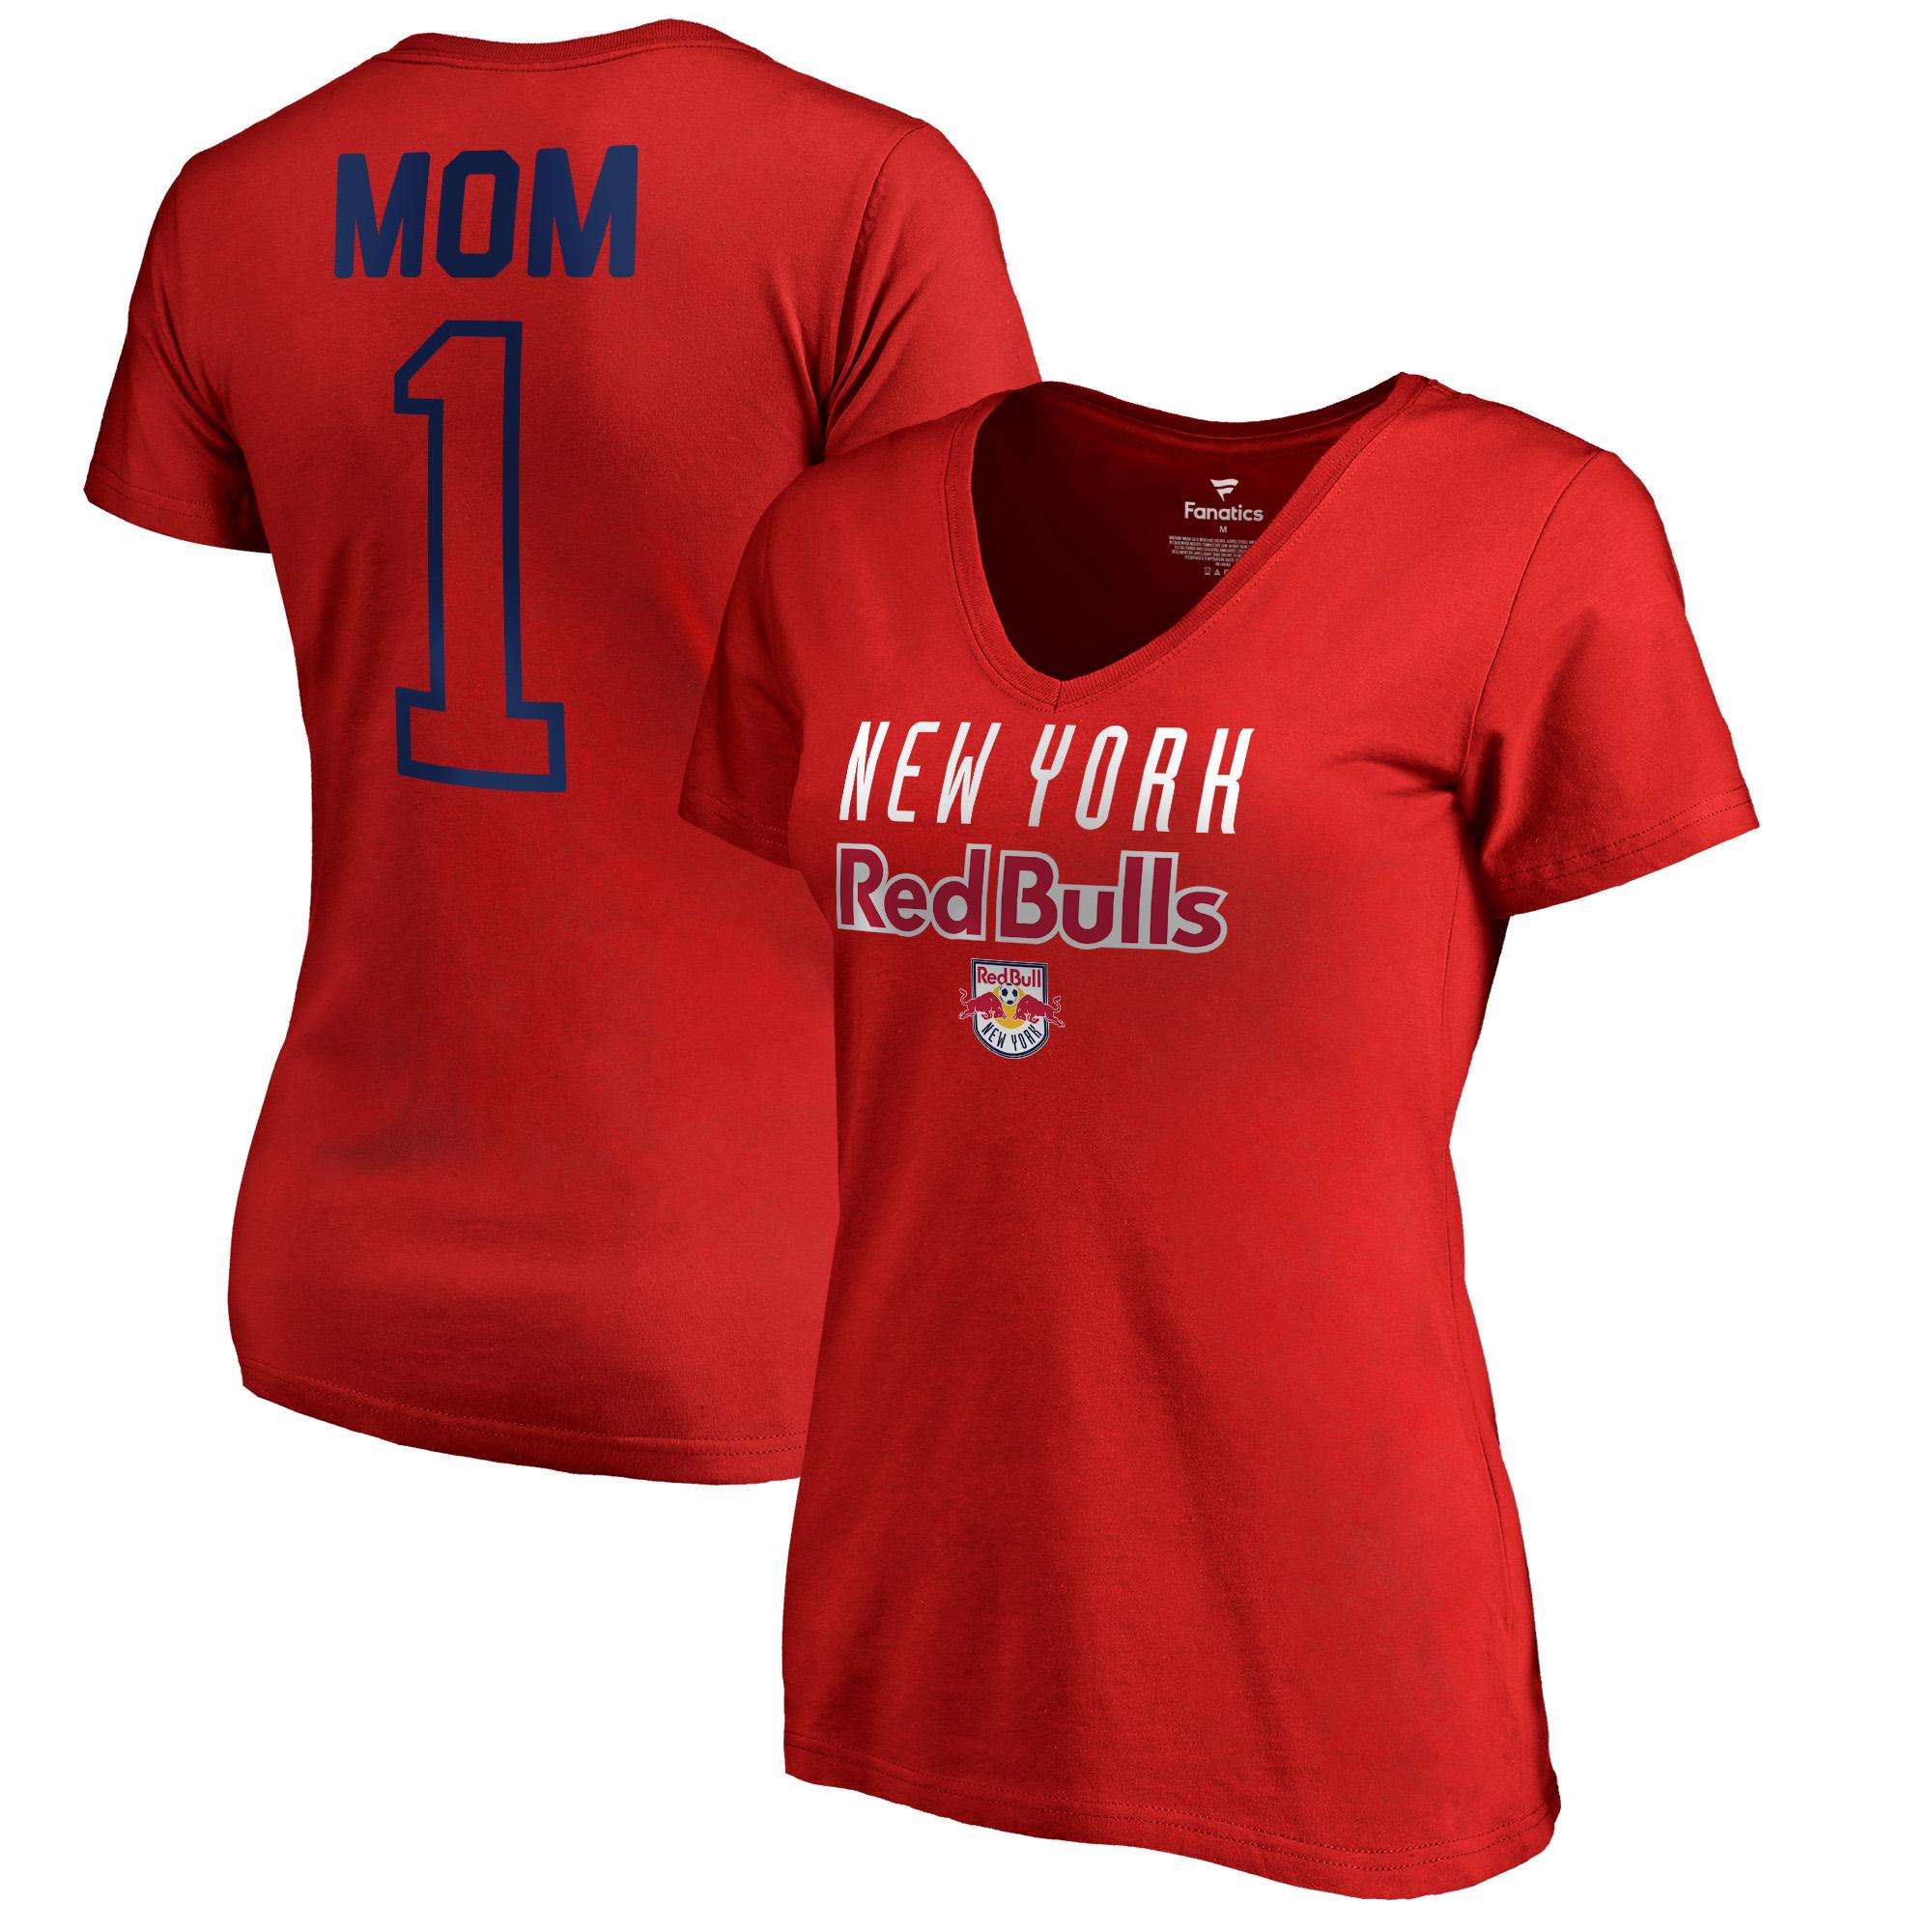 New York Red Bulls Fanatics Branded Women's #1 Mom T-Shirt - Red